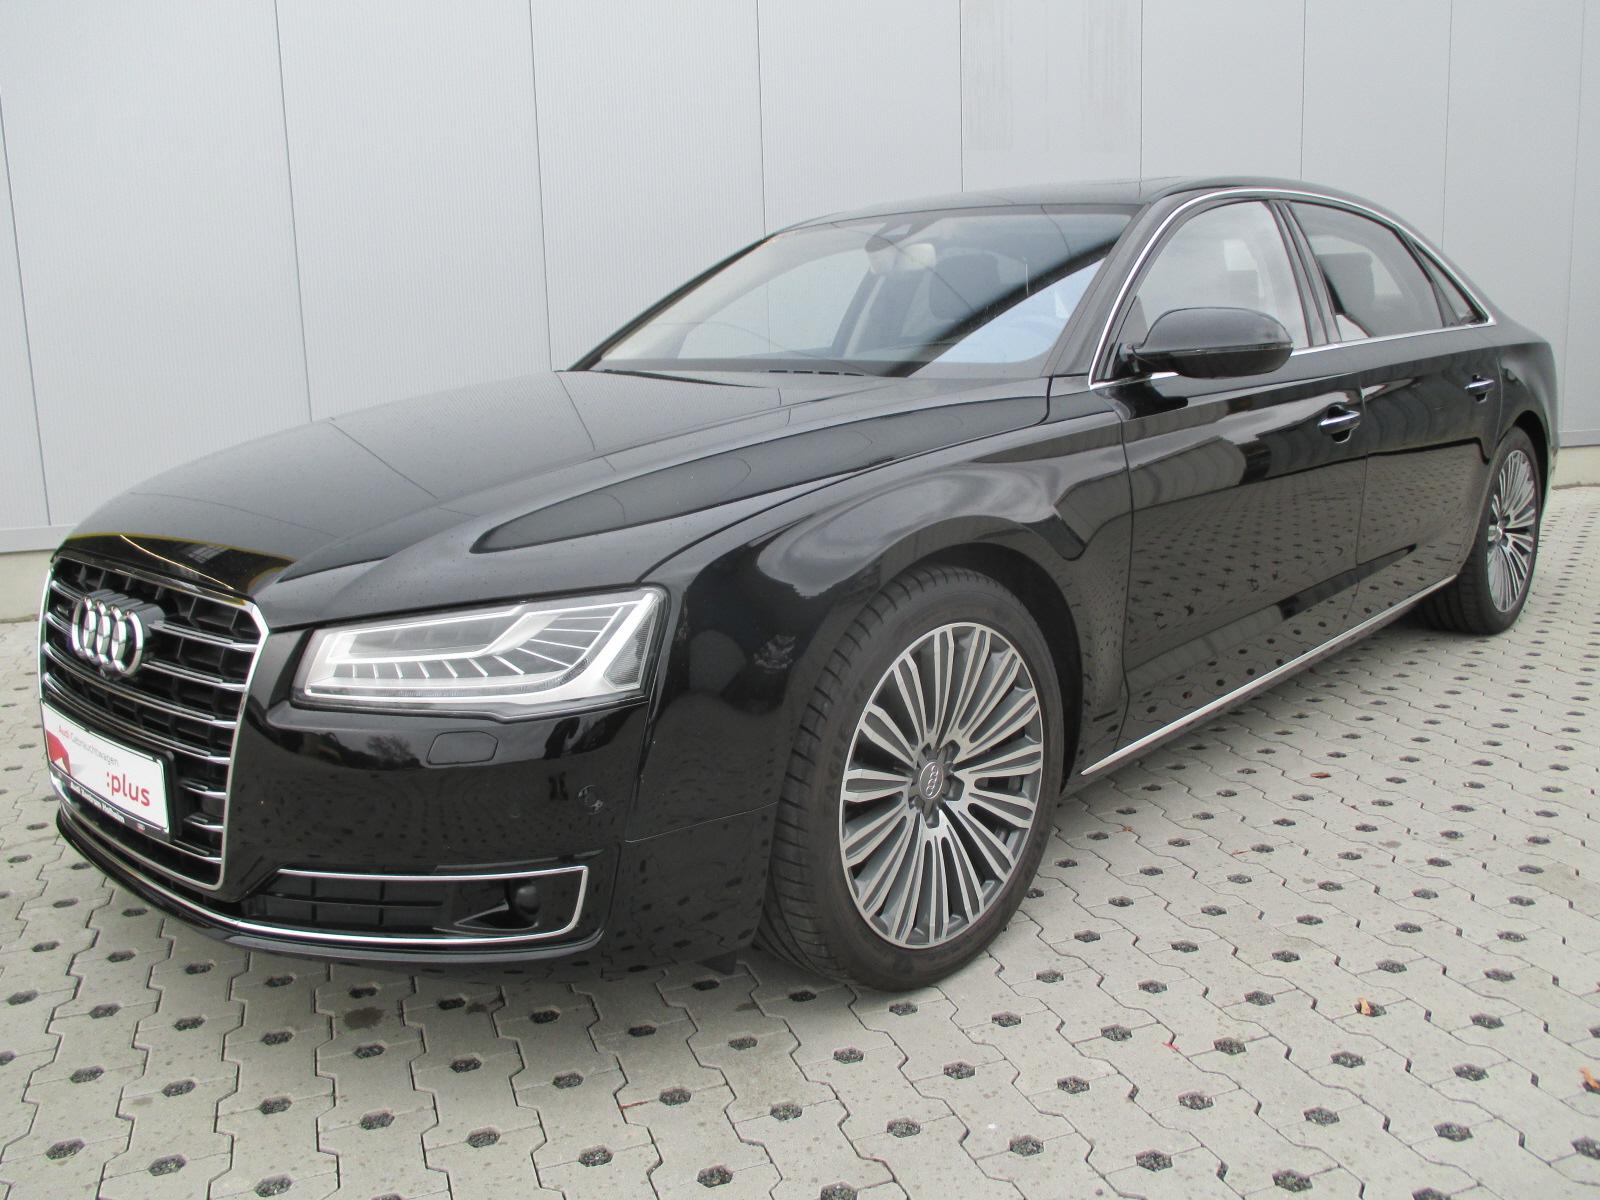 Audi A8 lang 3.0 TDI 193 KW*EUPE 141.900*HUD*Pano*RSE, Jahr 2015, Diesel